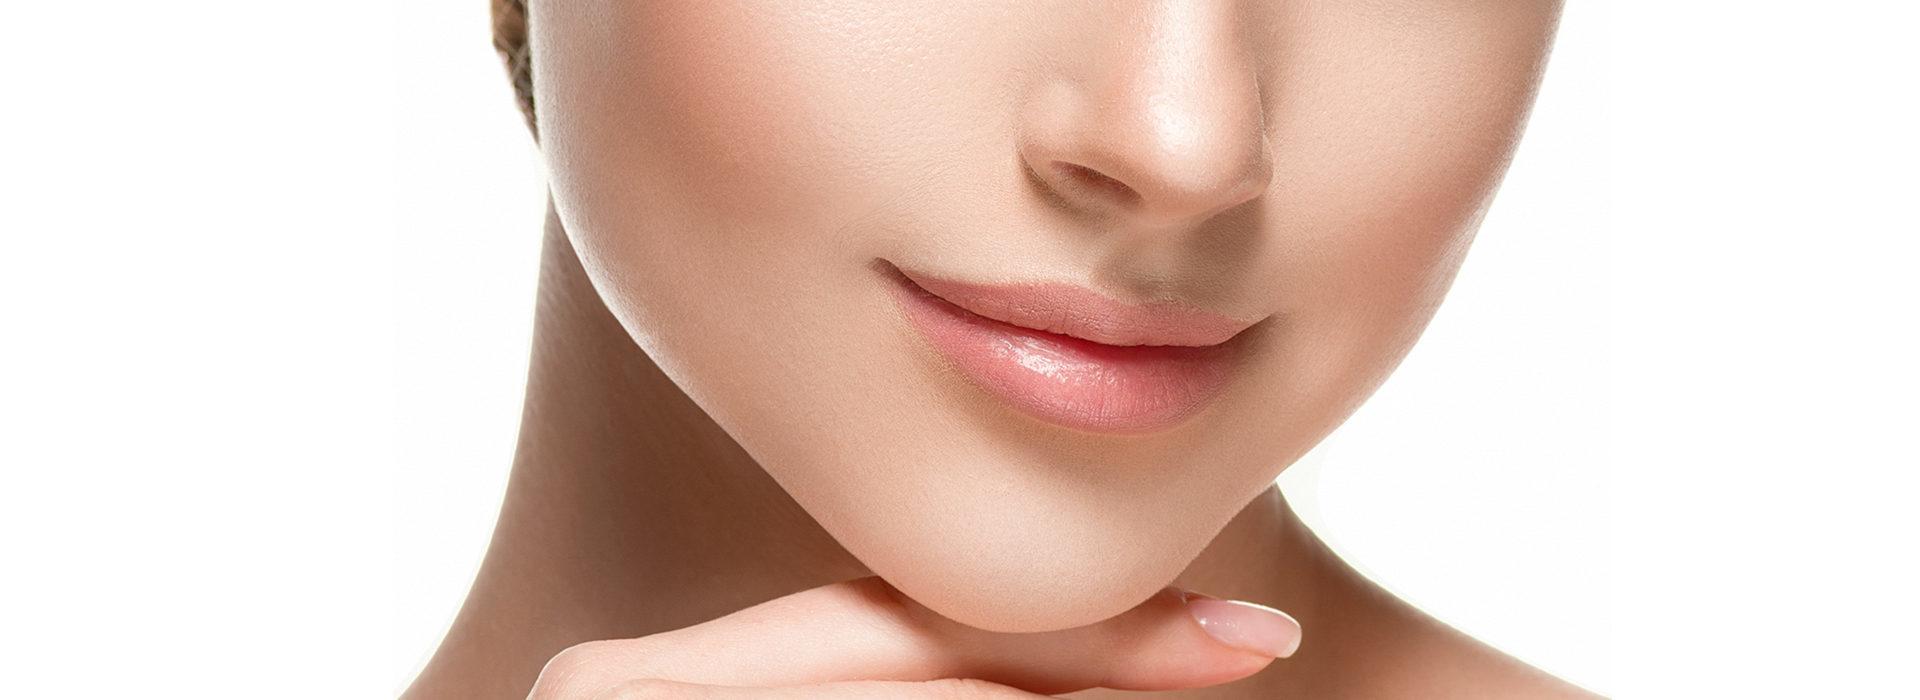 jak pielęgnować kąciki ust